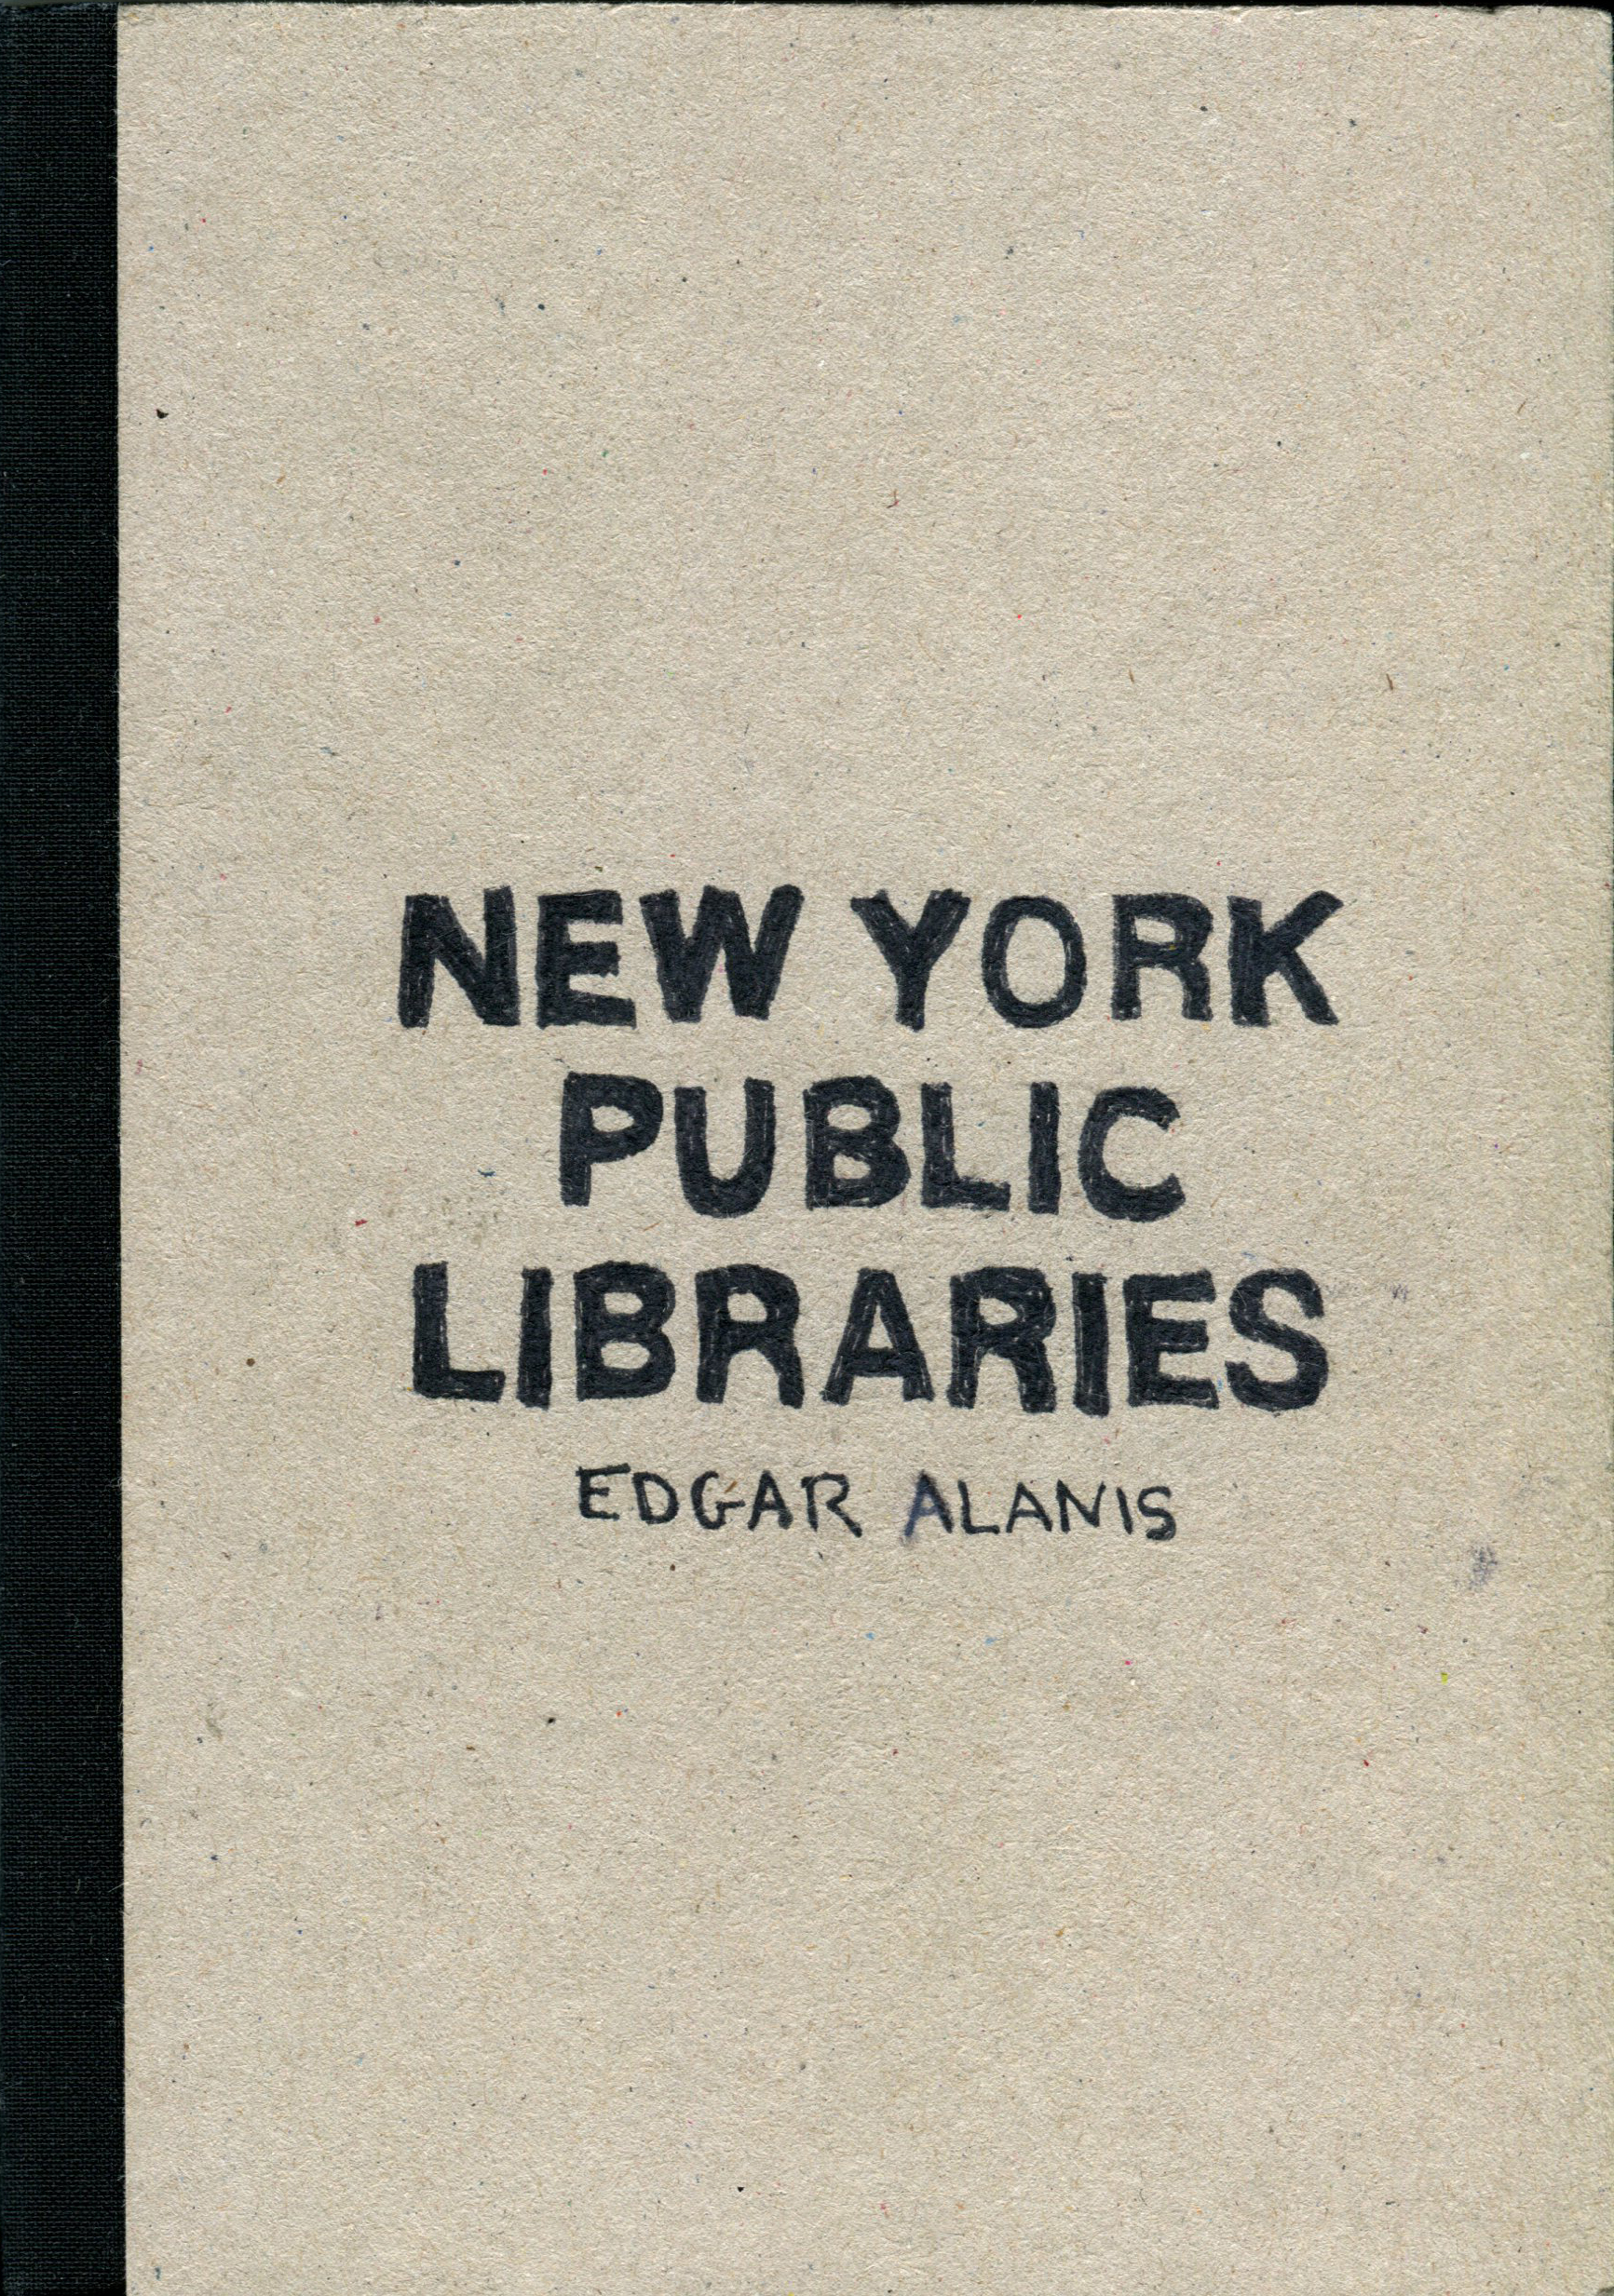 LibrariesSketchbookCover